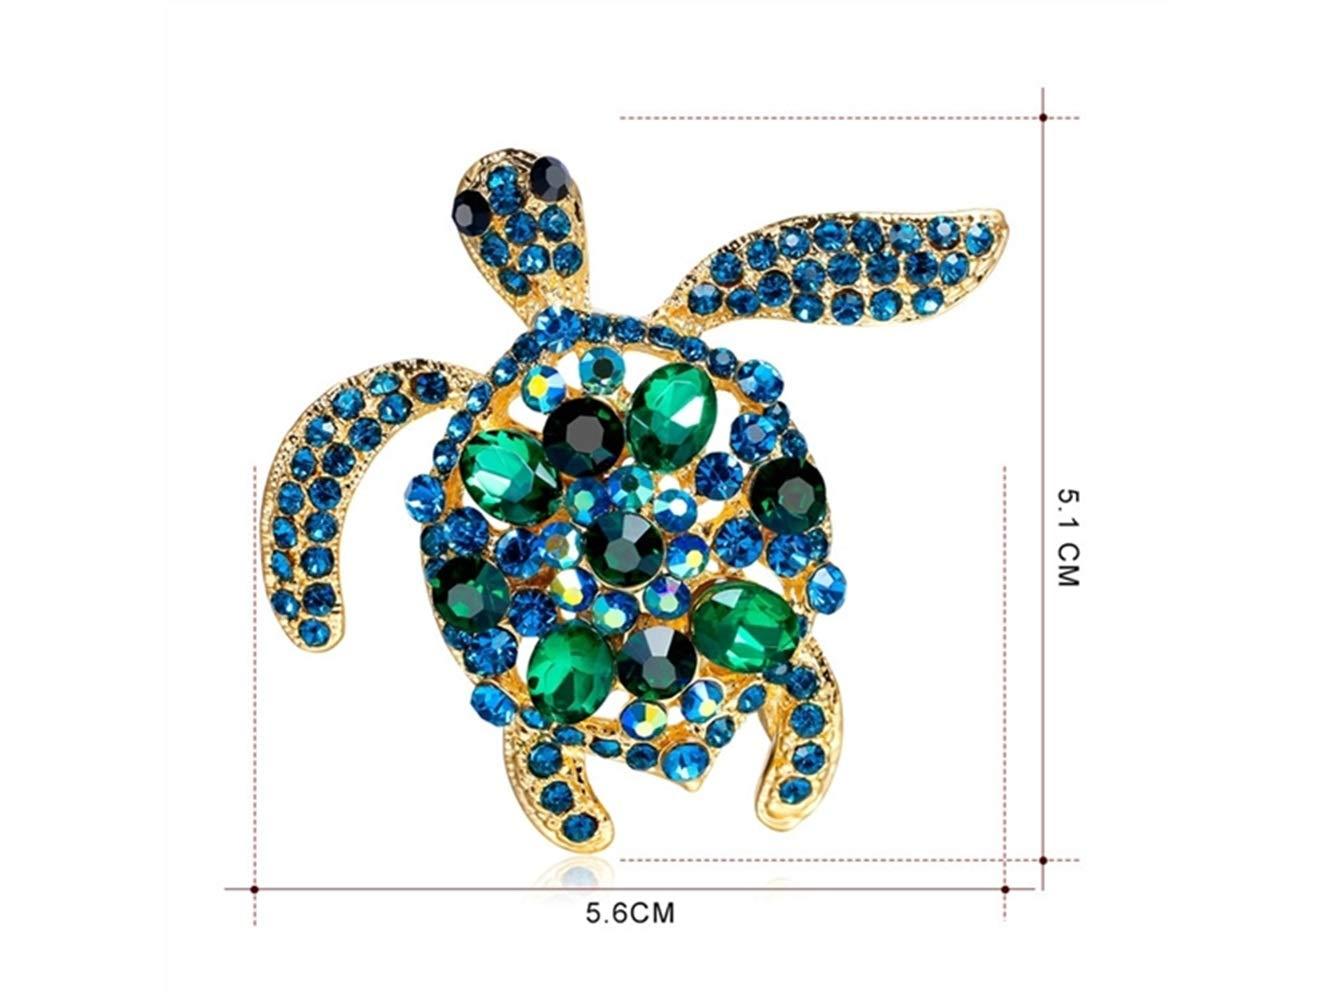 Yunqir Cute Sea Turtle Brooch Crystal Brooch Wedding Scarves Corsage Decoration for Women Birthday Gift (Blue) (Color : Blue, Size : 5.6x5.1cm)